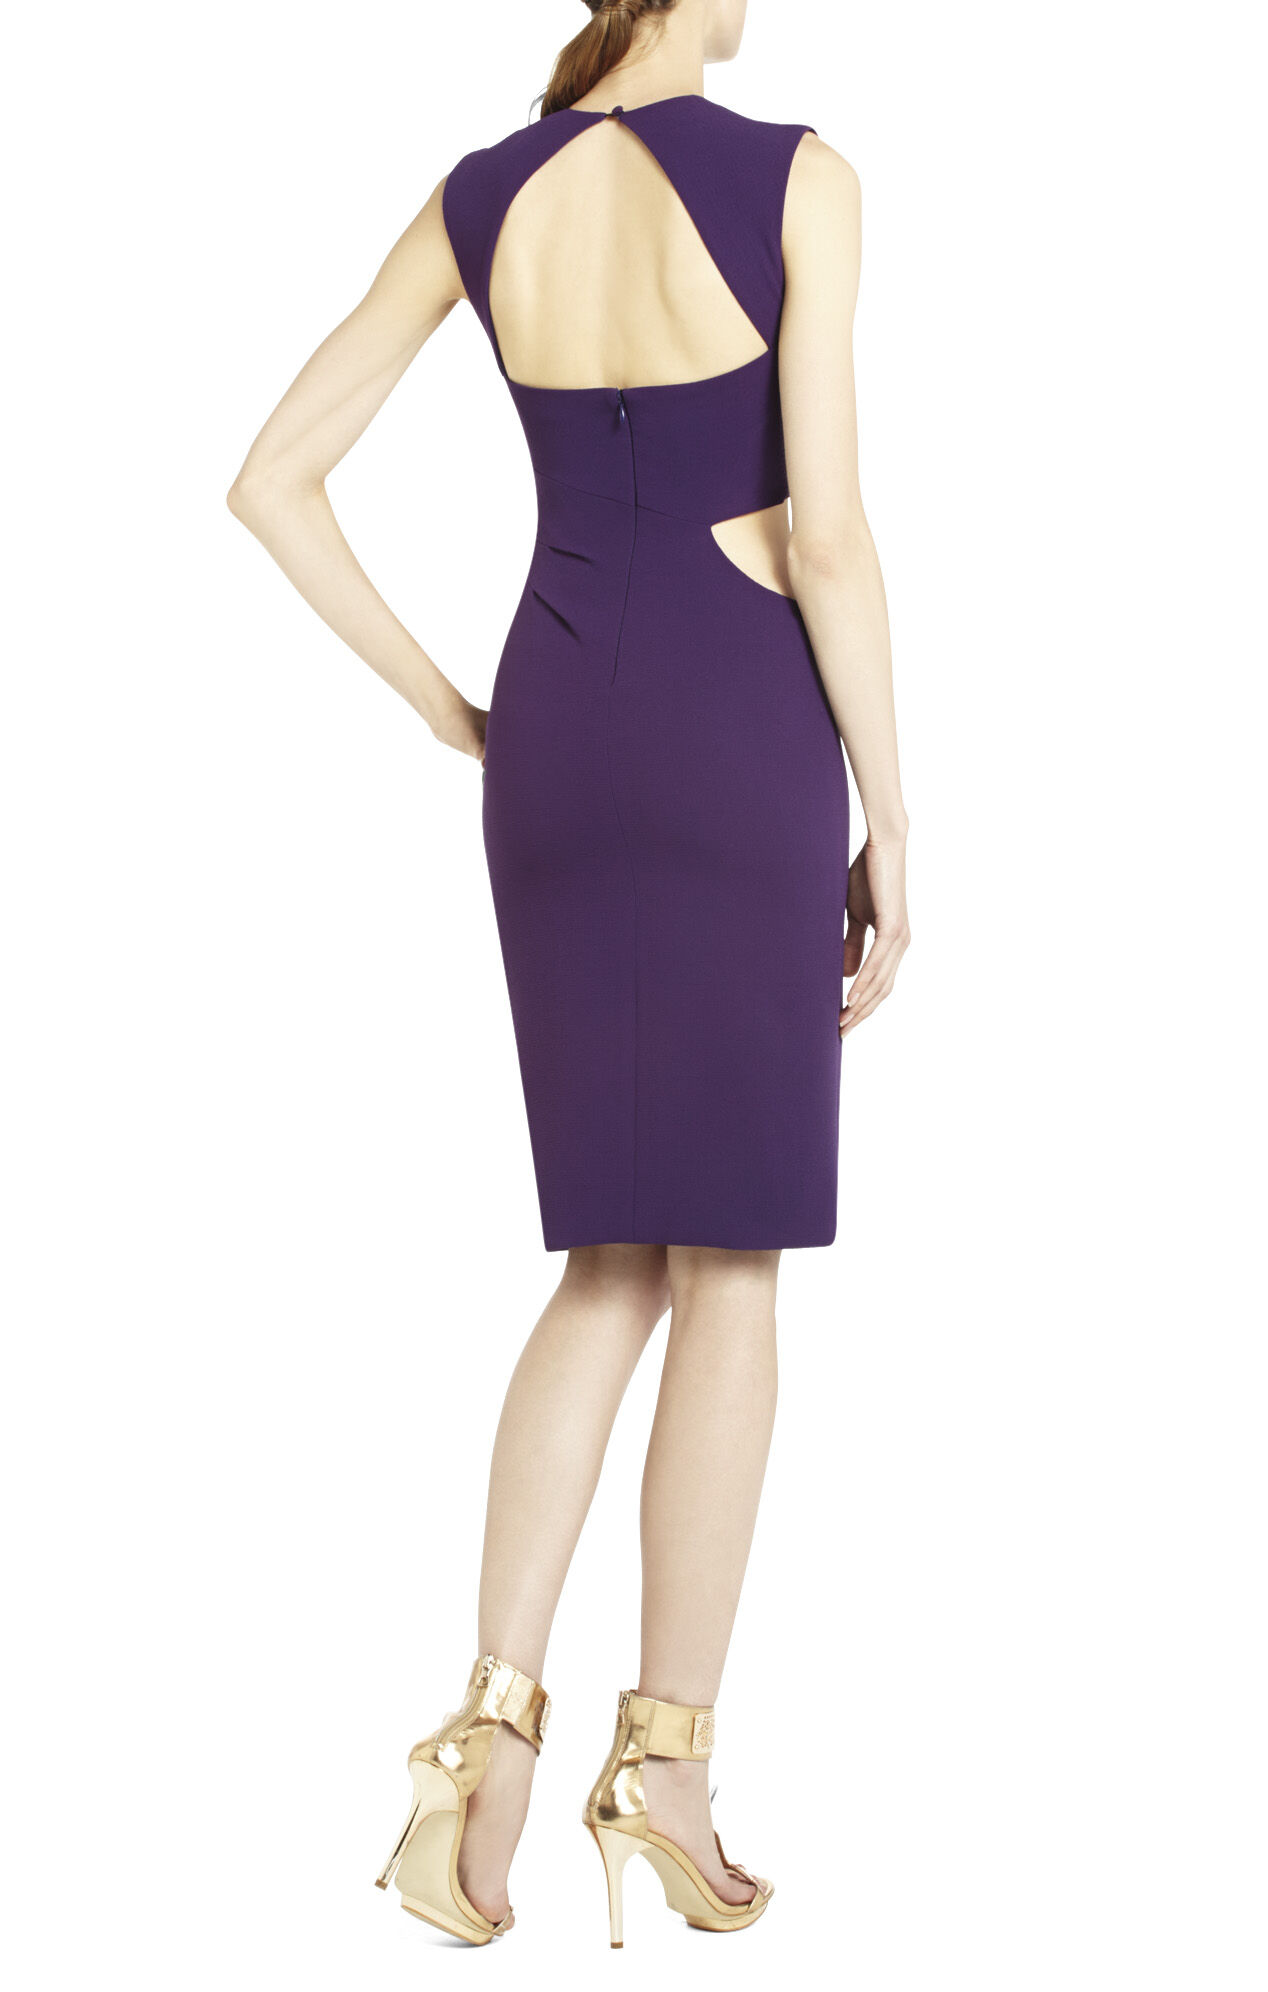 Laura Sleeveless Cutout Dress